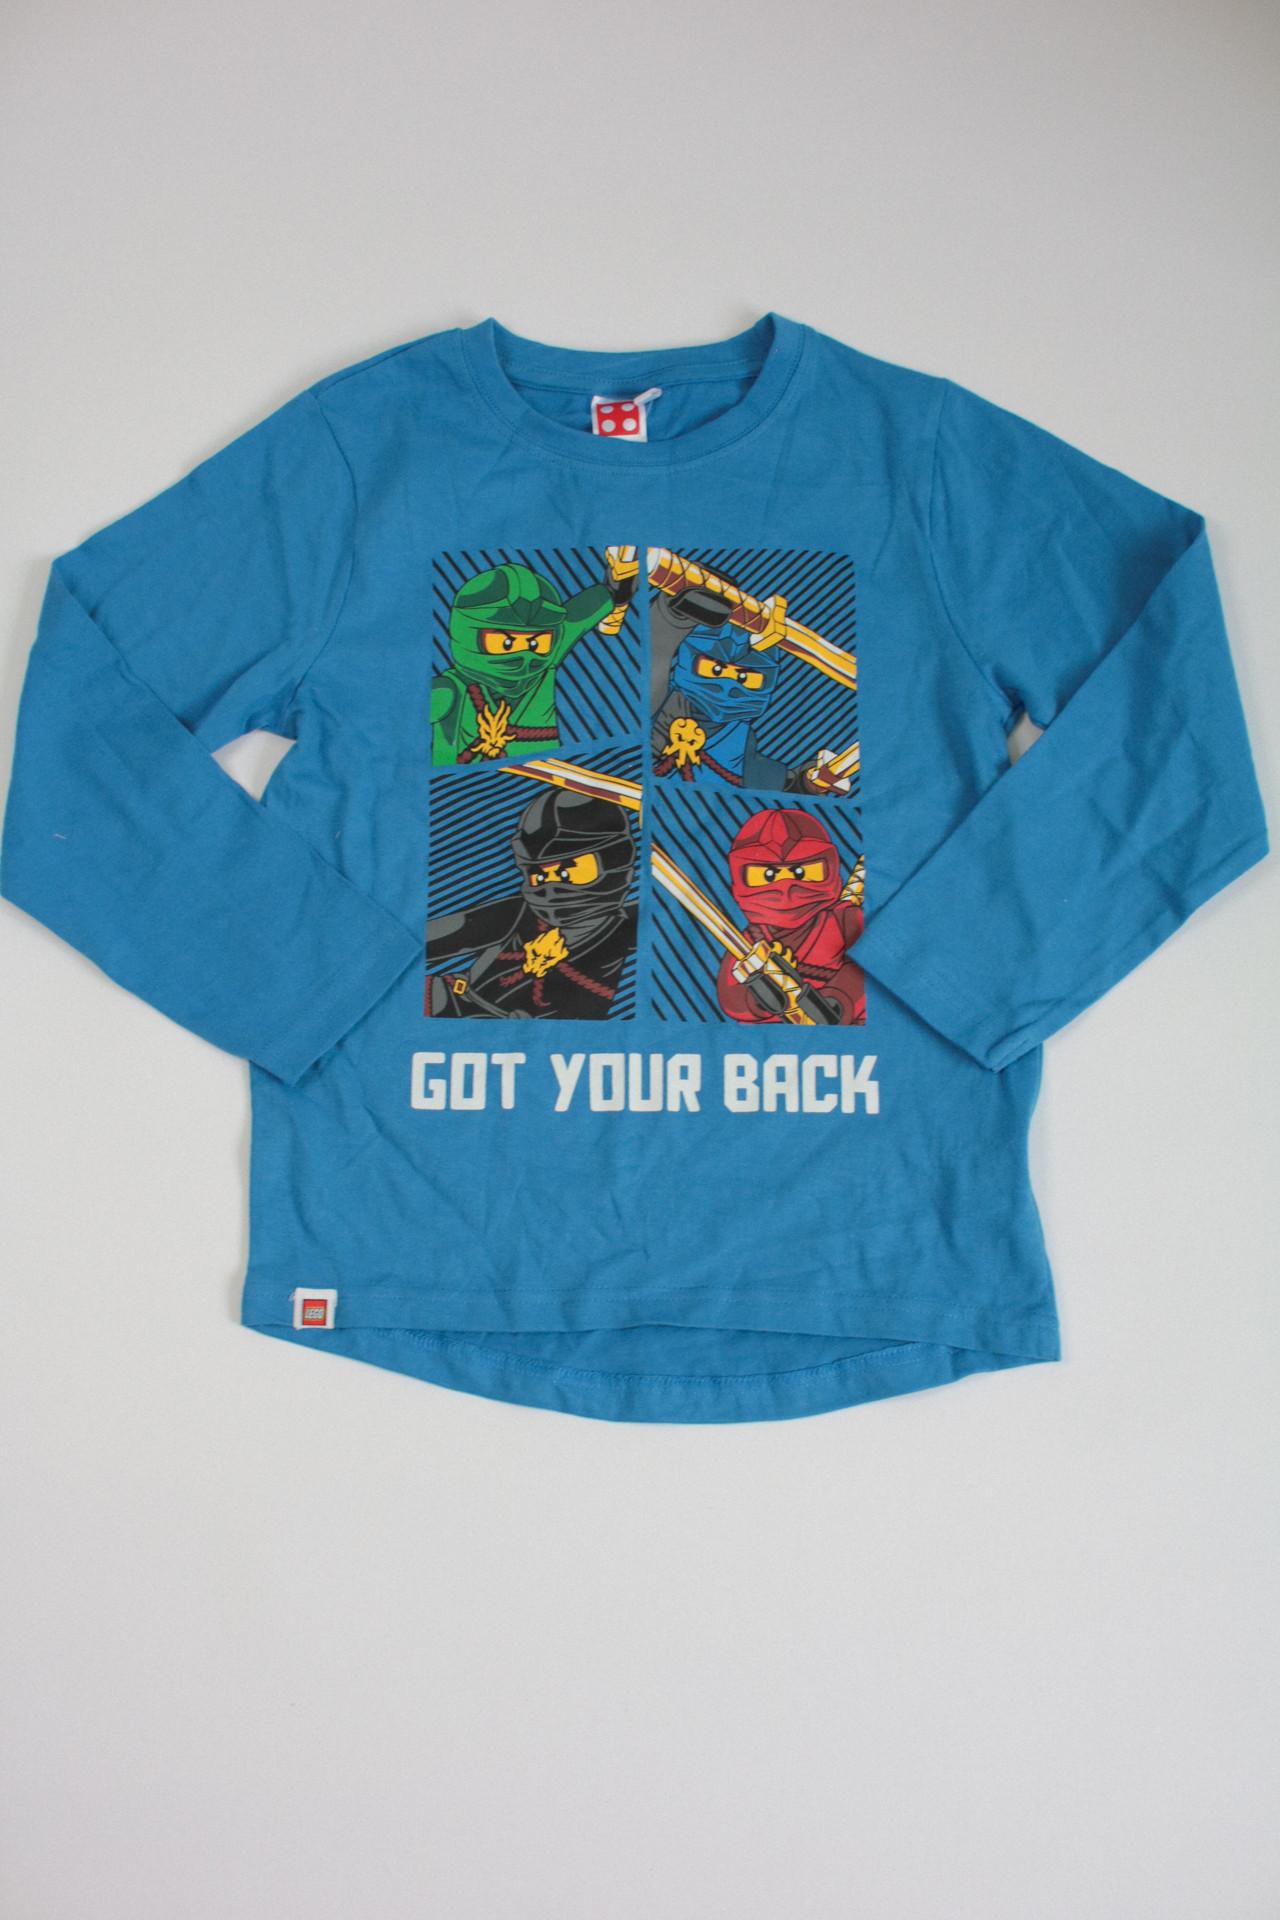 copy of shirt - 1